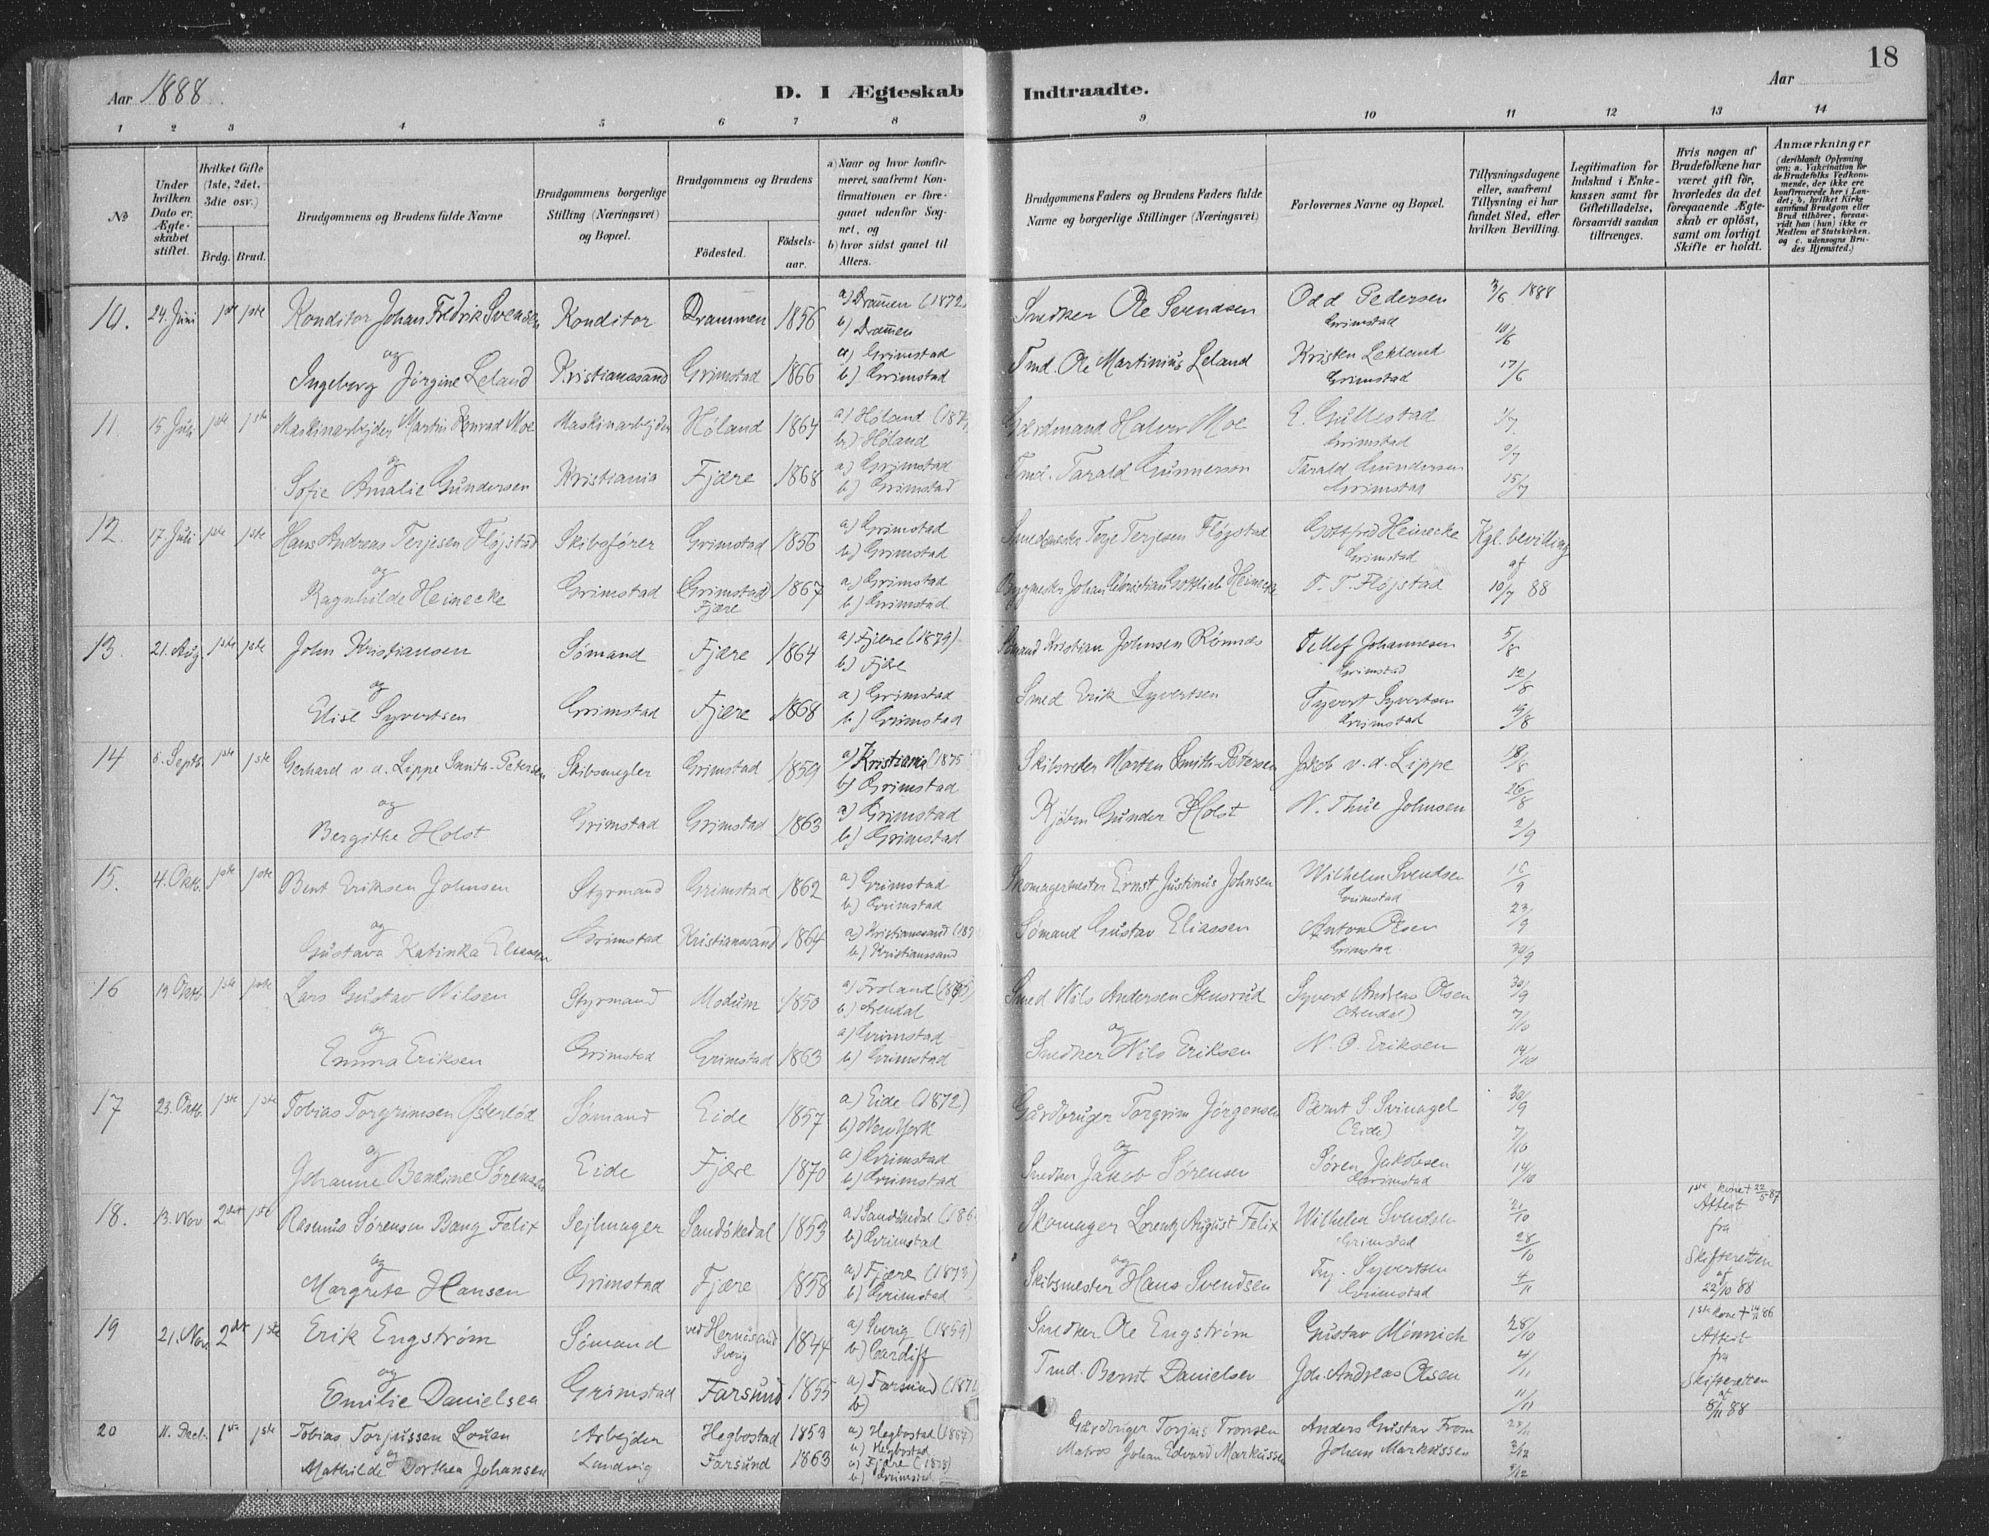 SAK, Grimstad sokneprestkontor, F/Fa/L0004: Ministerialbok nr. A 3, 1882-1910, s. 18